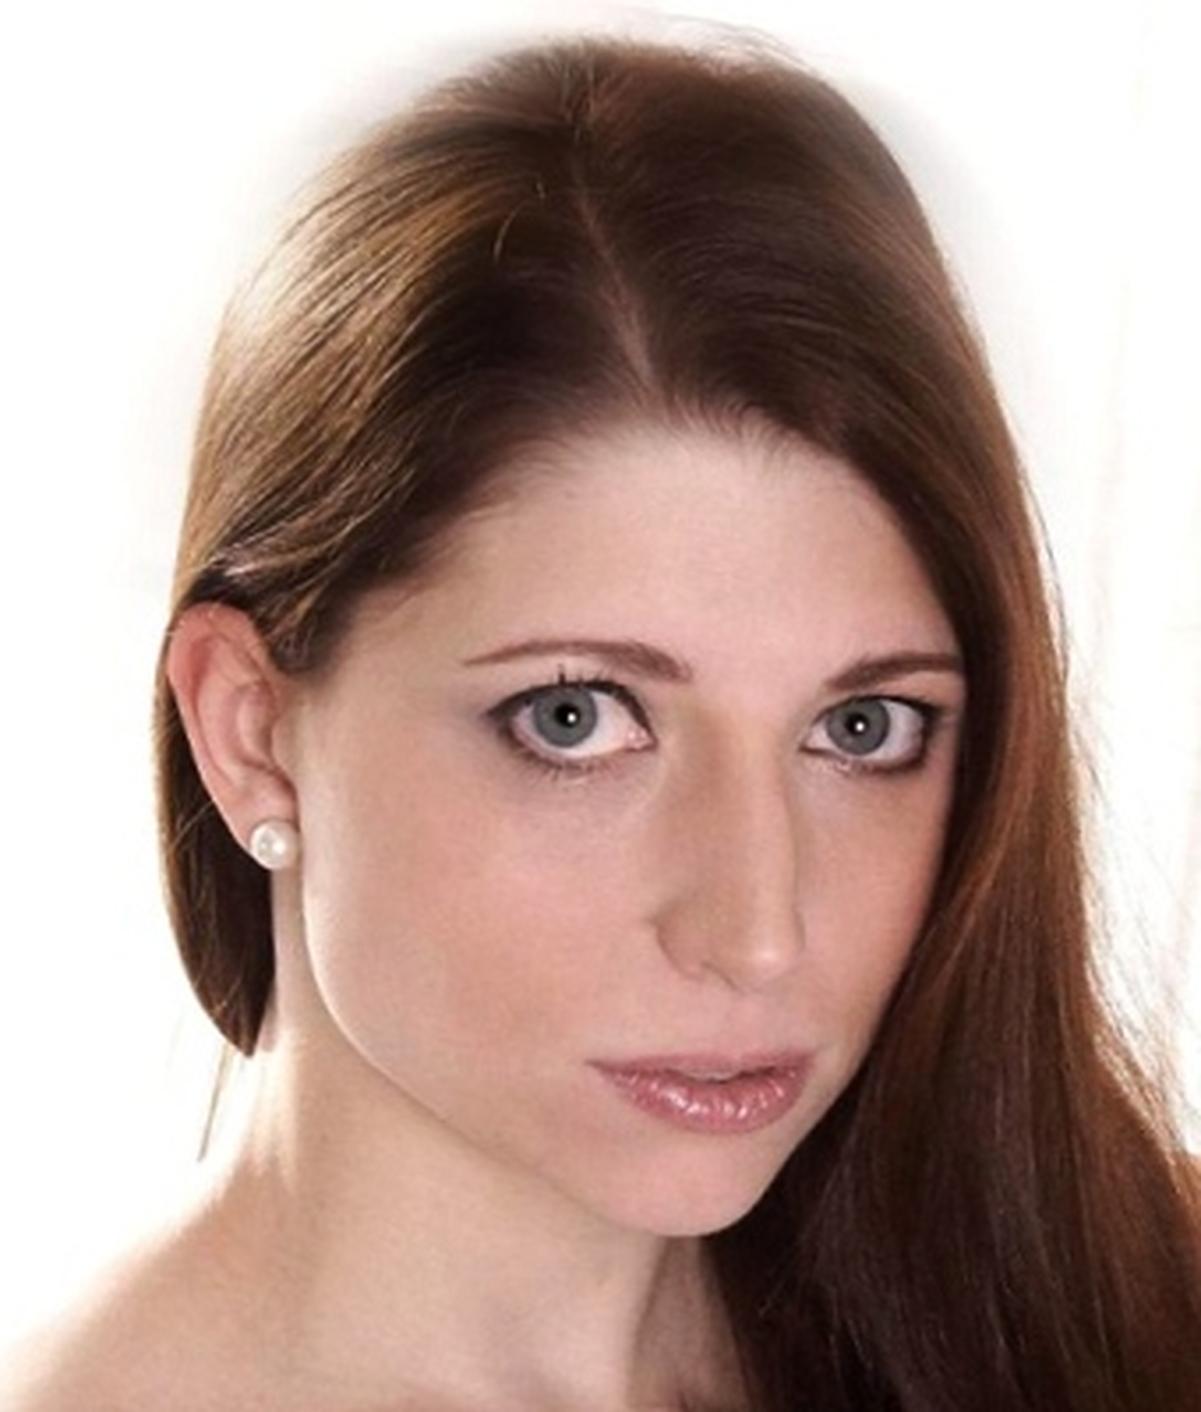 Natalie Bisous